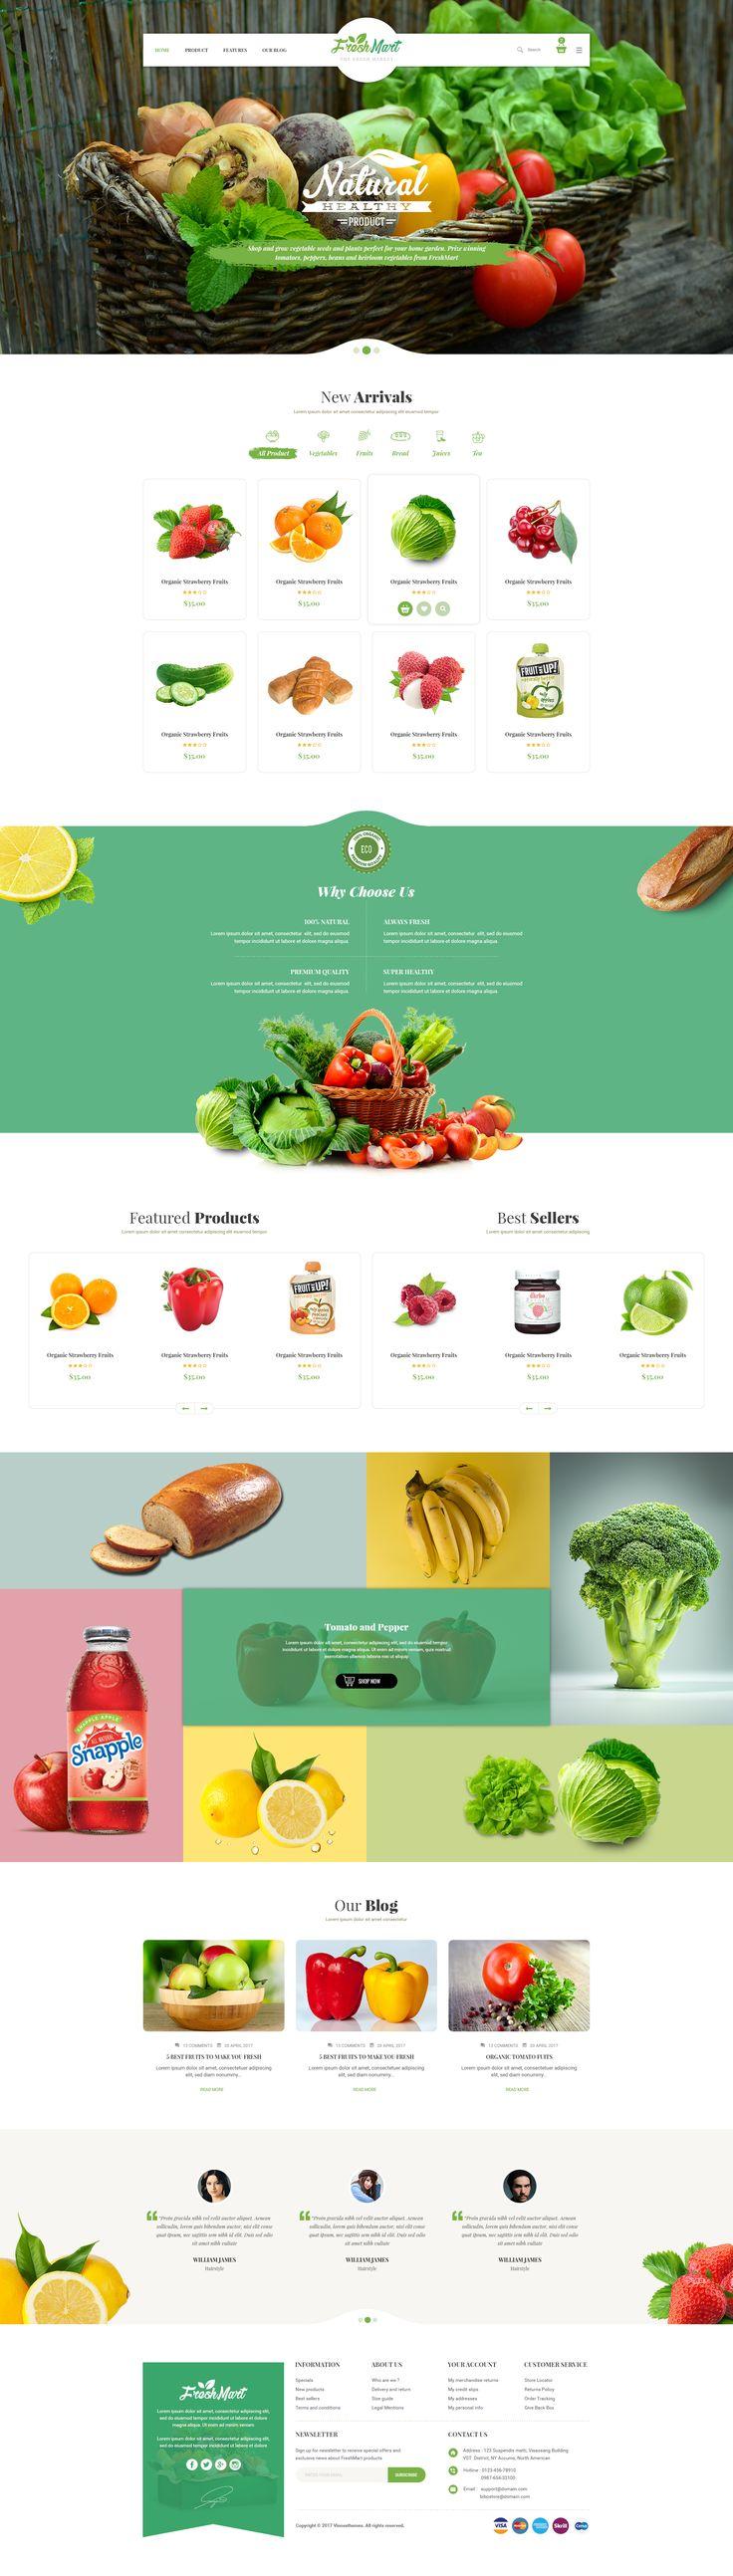 FreshMart - Organic Food PSD Template #organic food #shop #shopping • Download ➝ https://themeforest.net/item/freshmart-organic-food-psd-template/20095556?ref=pxcr